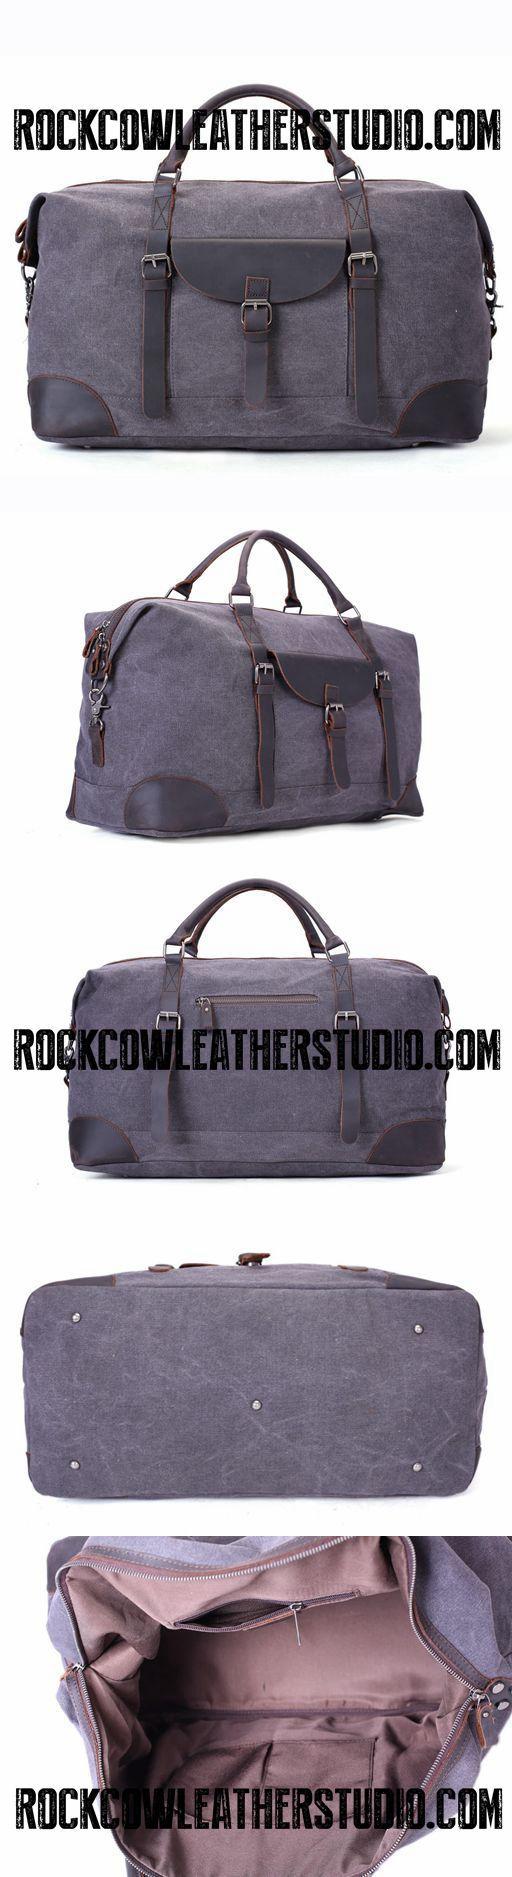 Waxed Canvas Overnight Duffle Bag, Holdall Bag, Sports Bag AF33